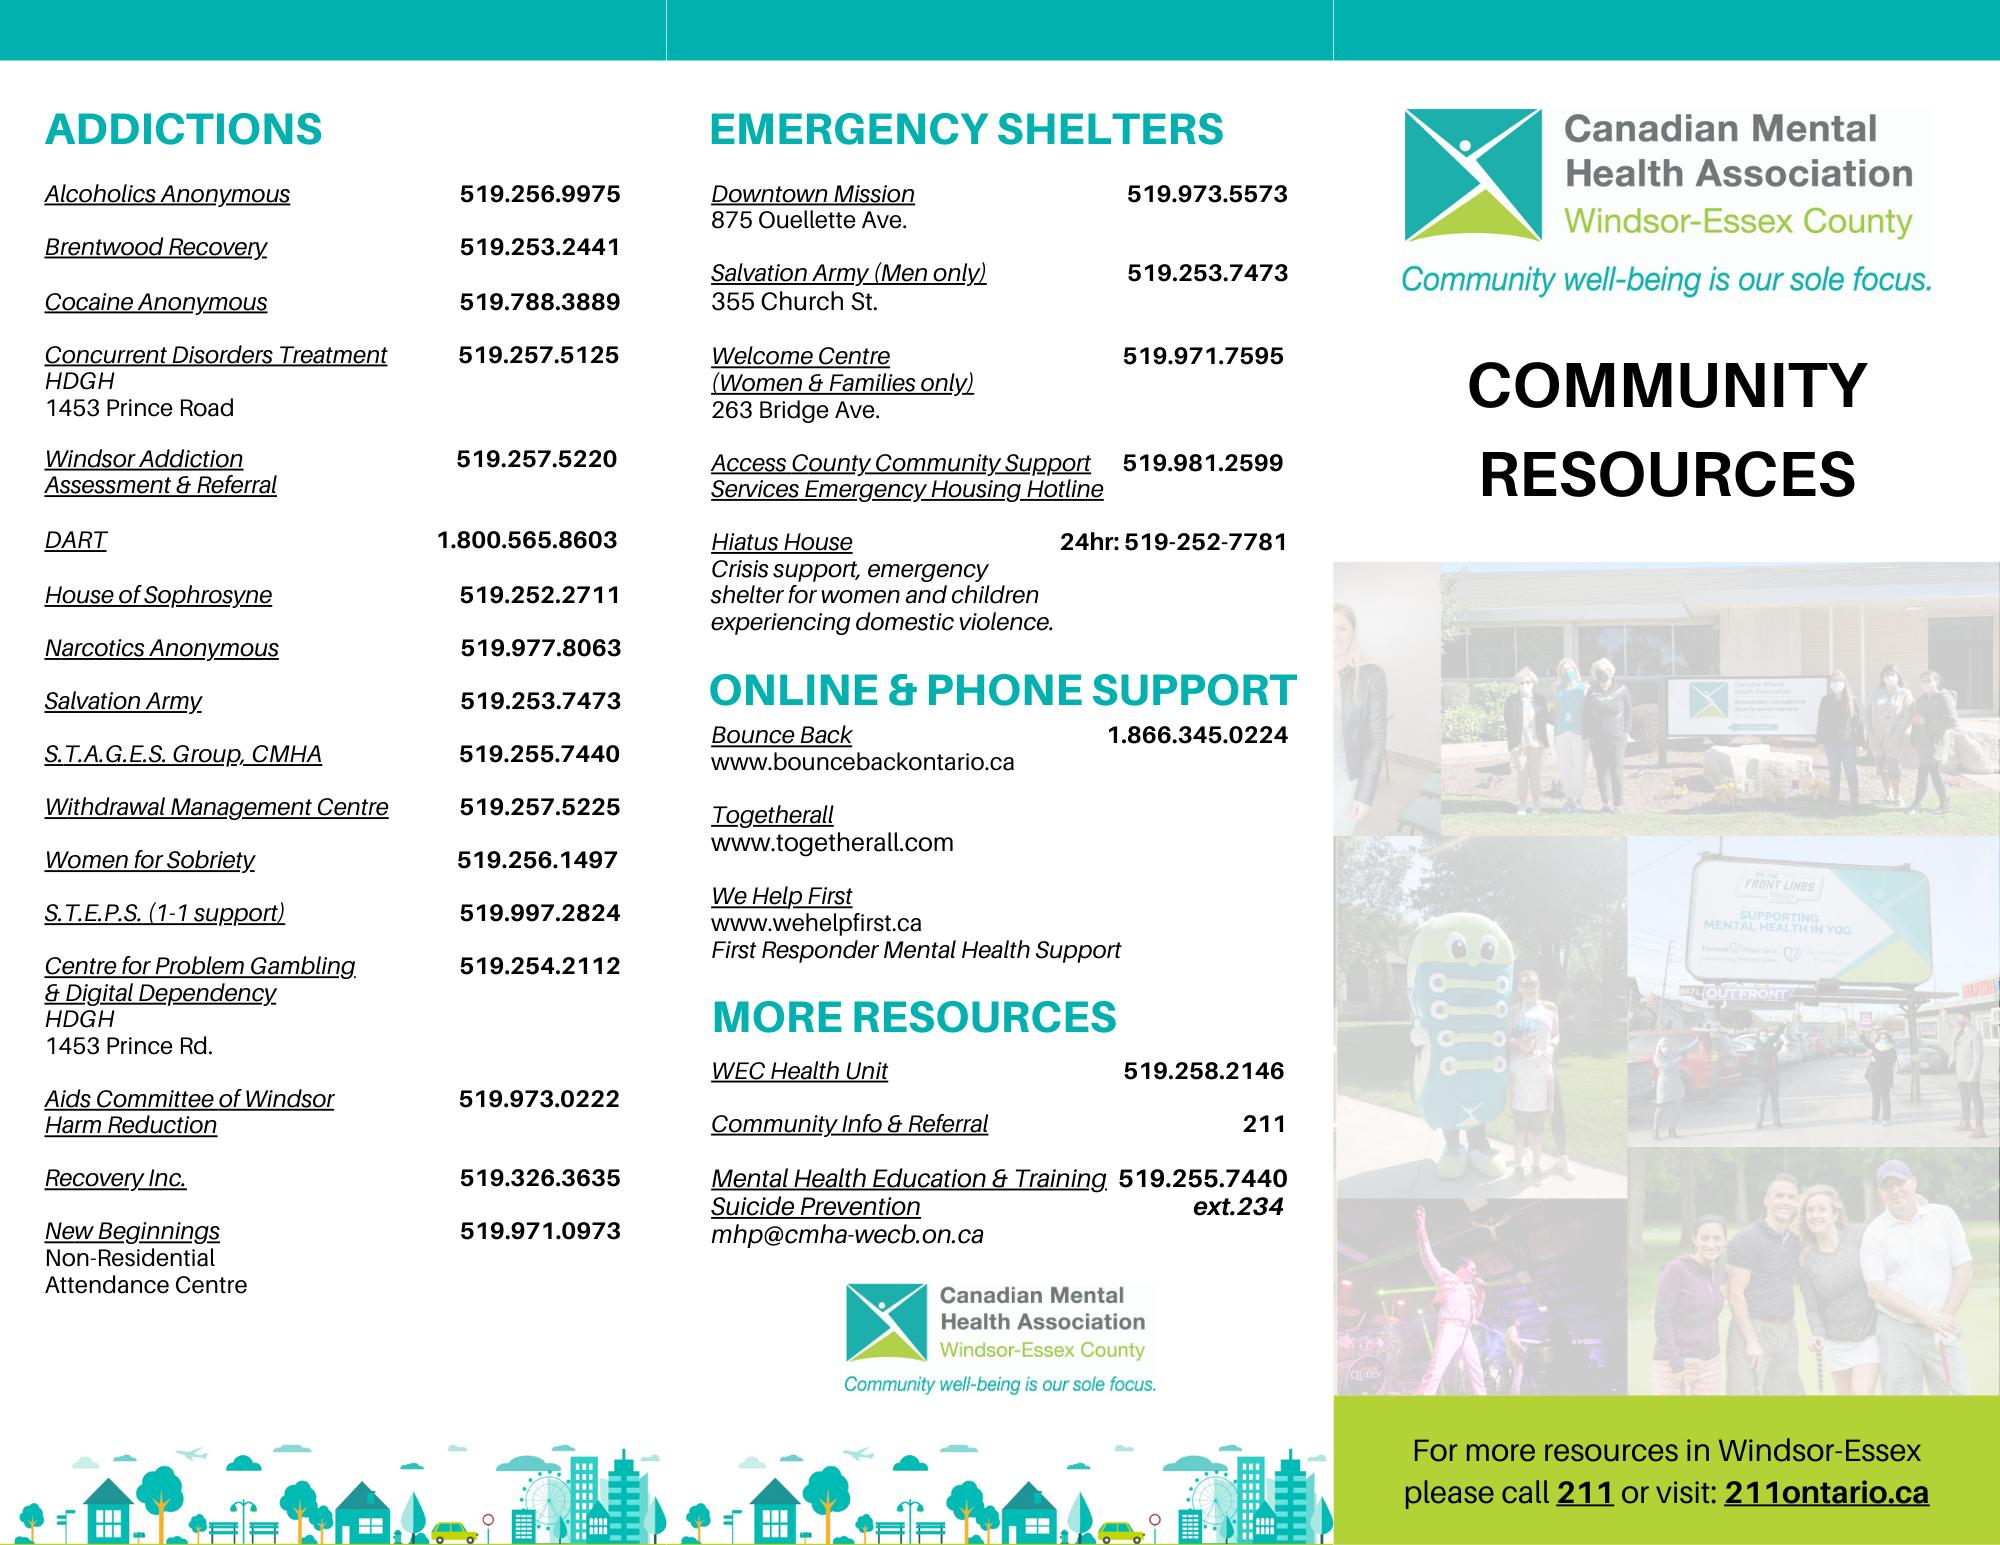 Community Resource Brochure